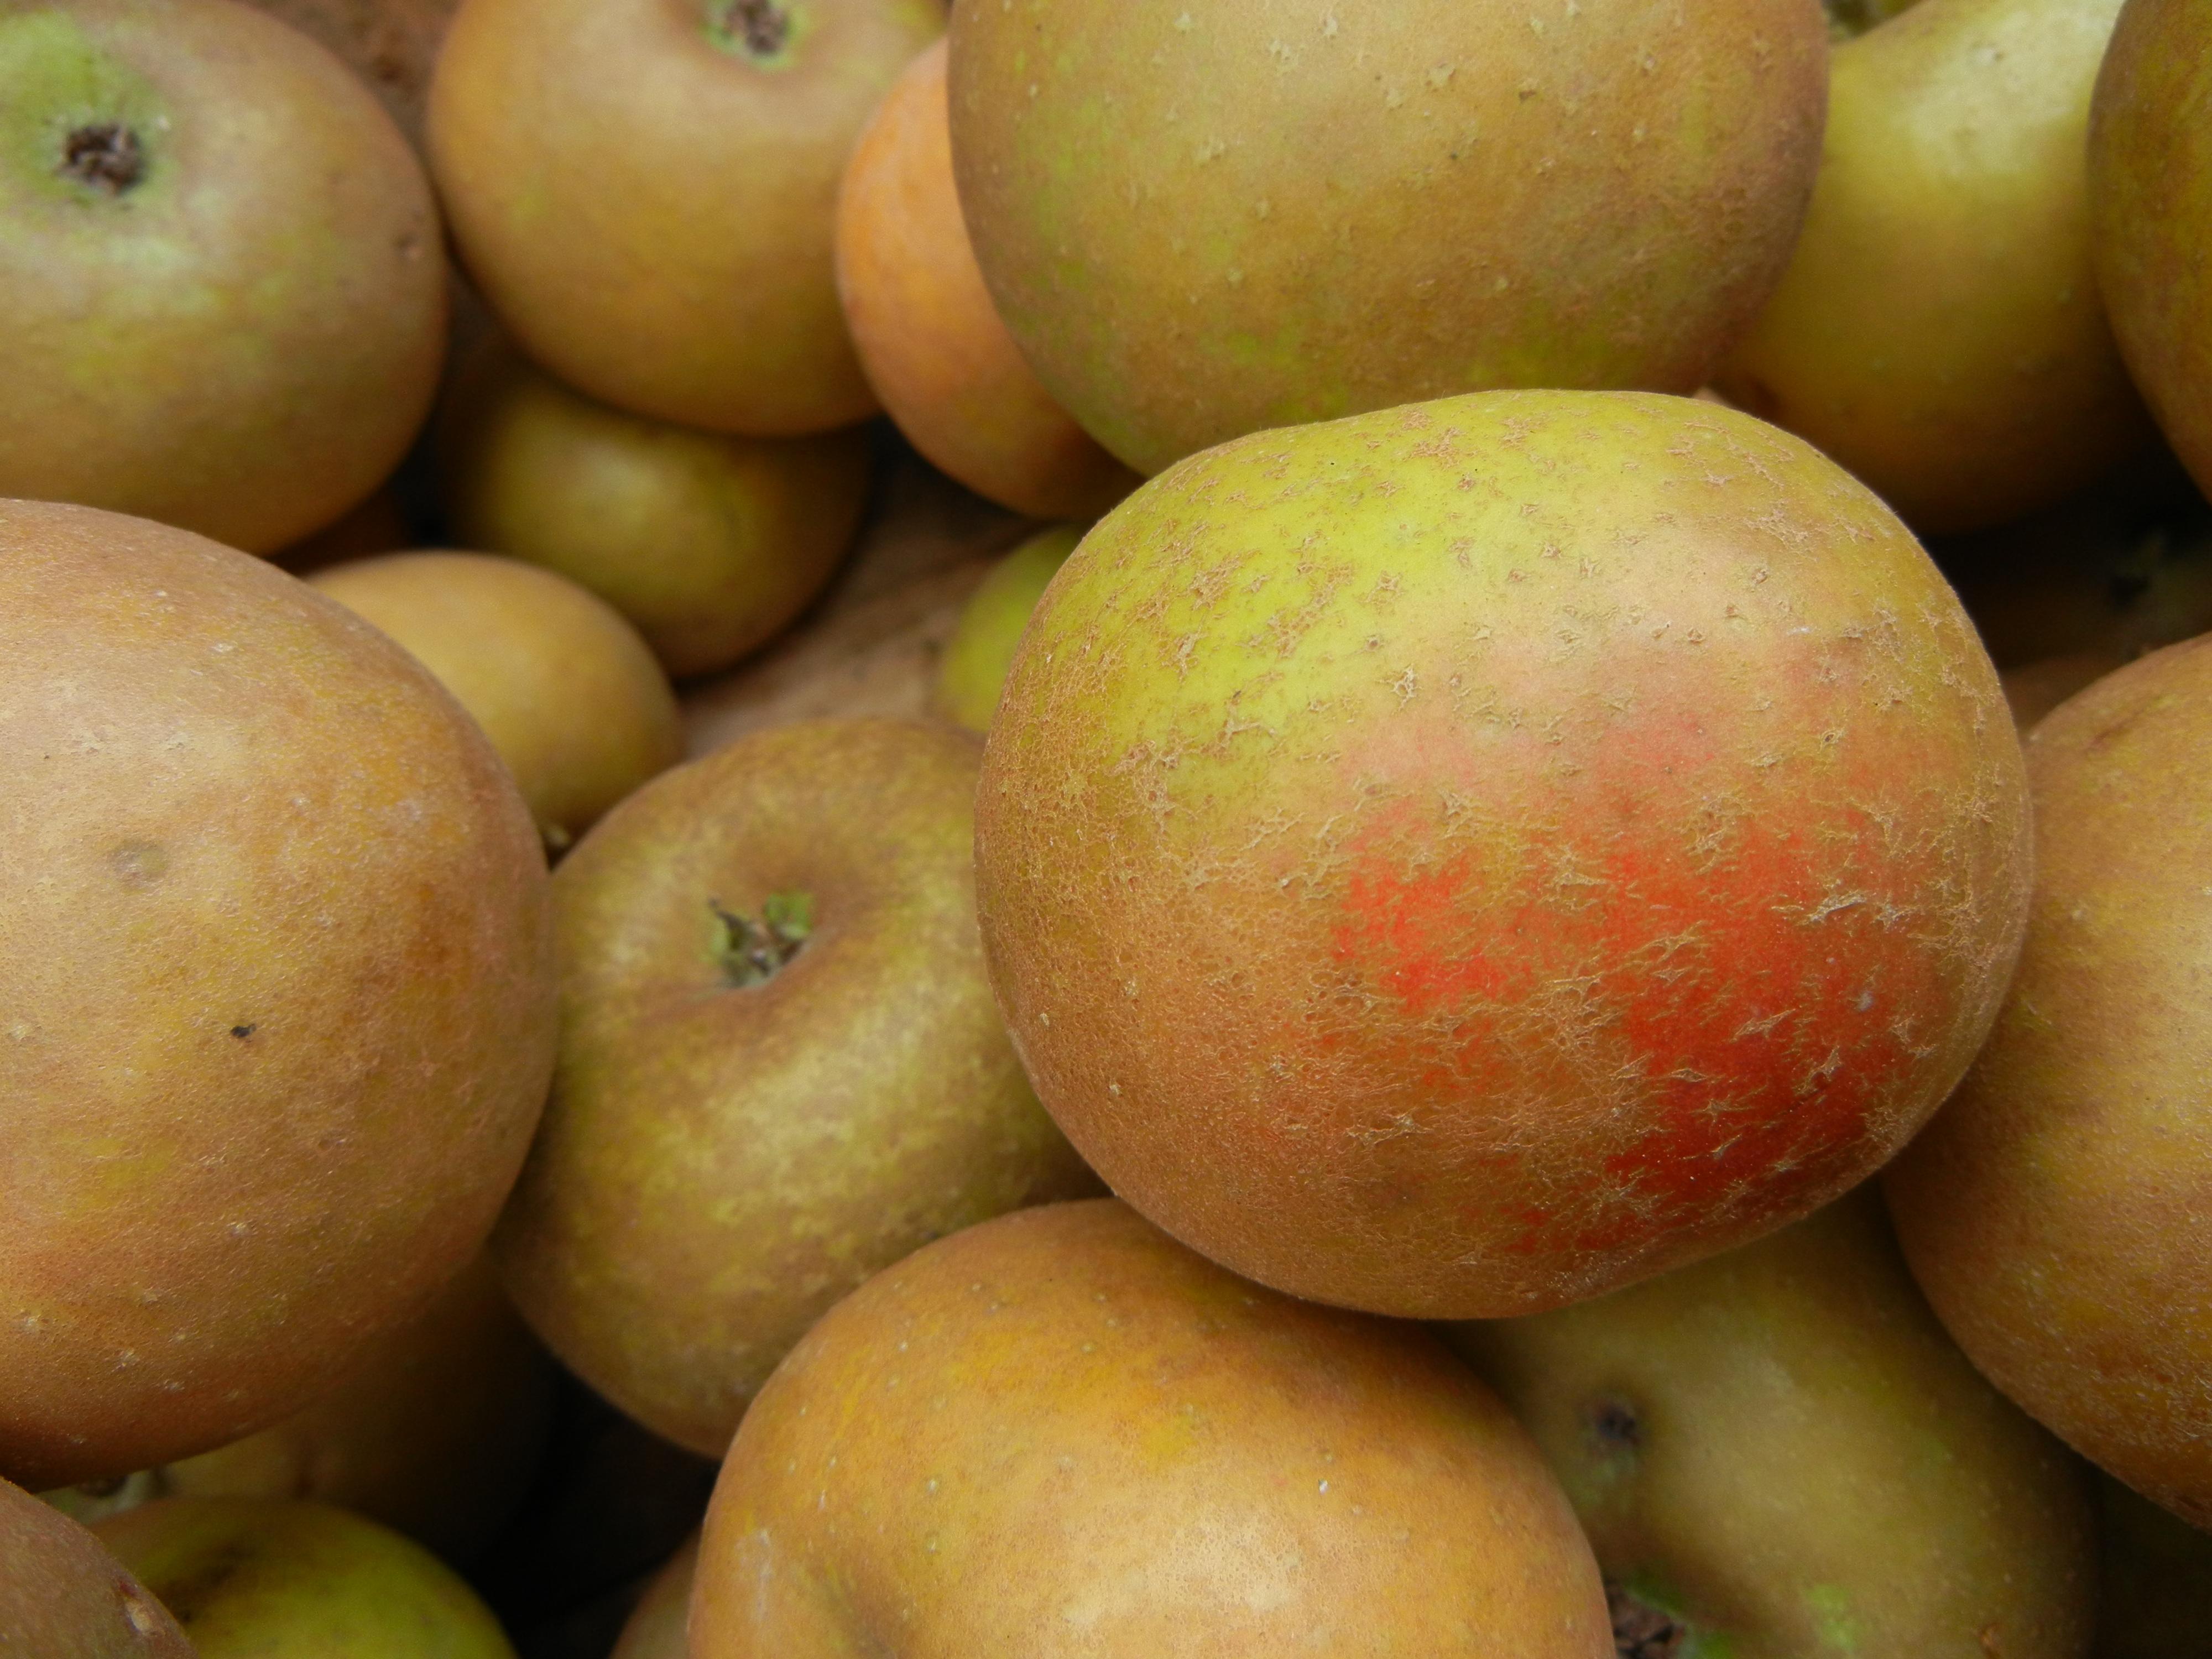 Ashmead's Kernel Apples.jpg